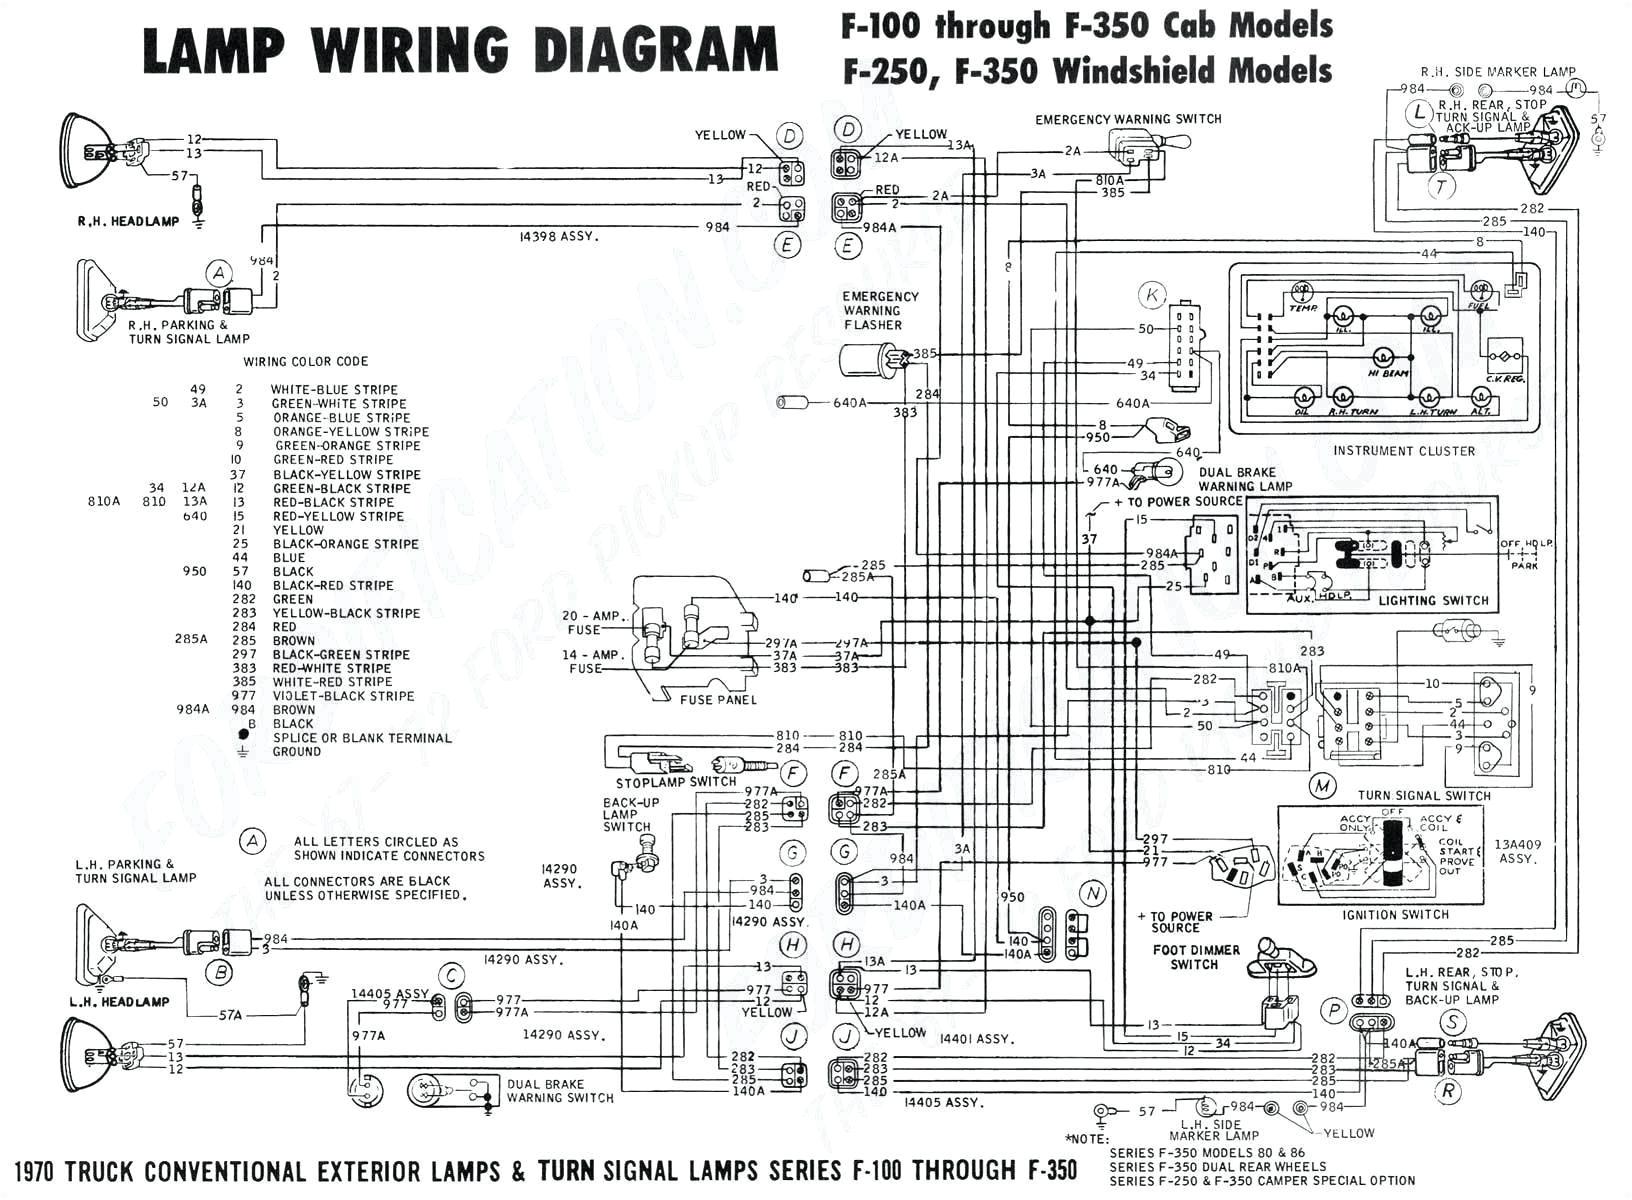 02 ford headlight wiring diagrams wiring diagram blog 2002 ford f350 headlight wiring